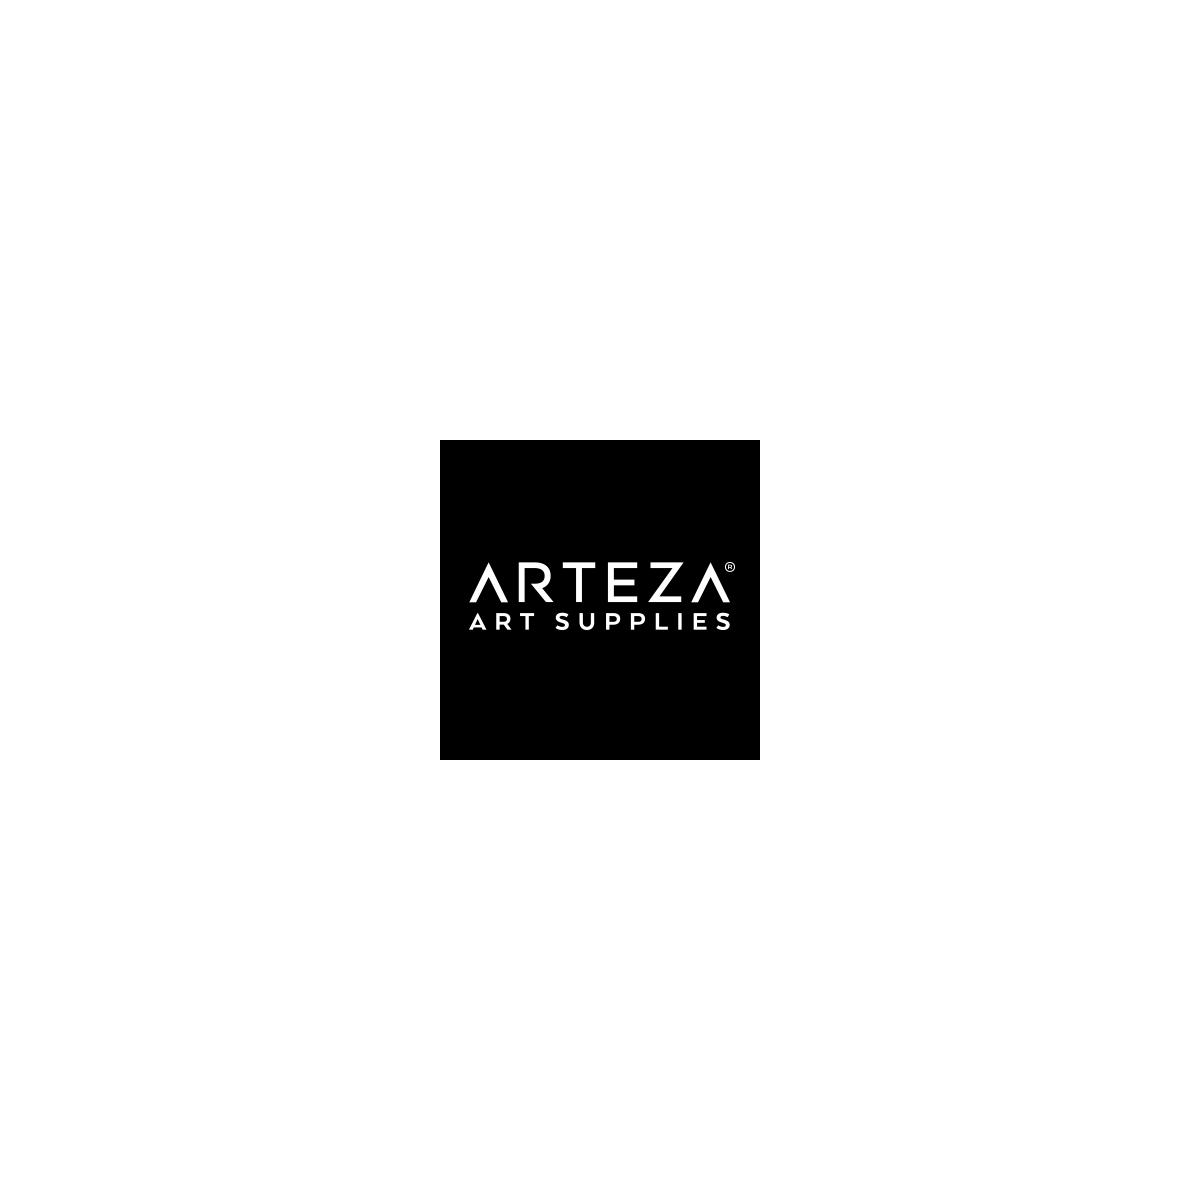 ARTEZA